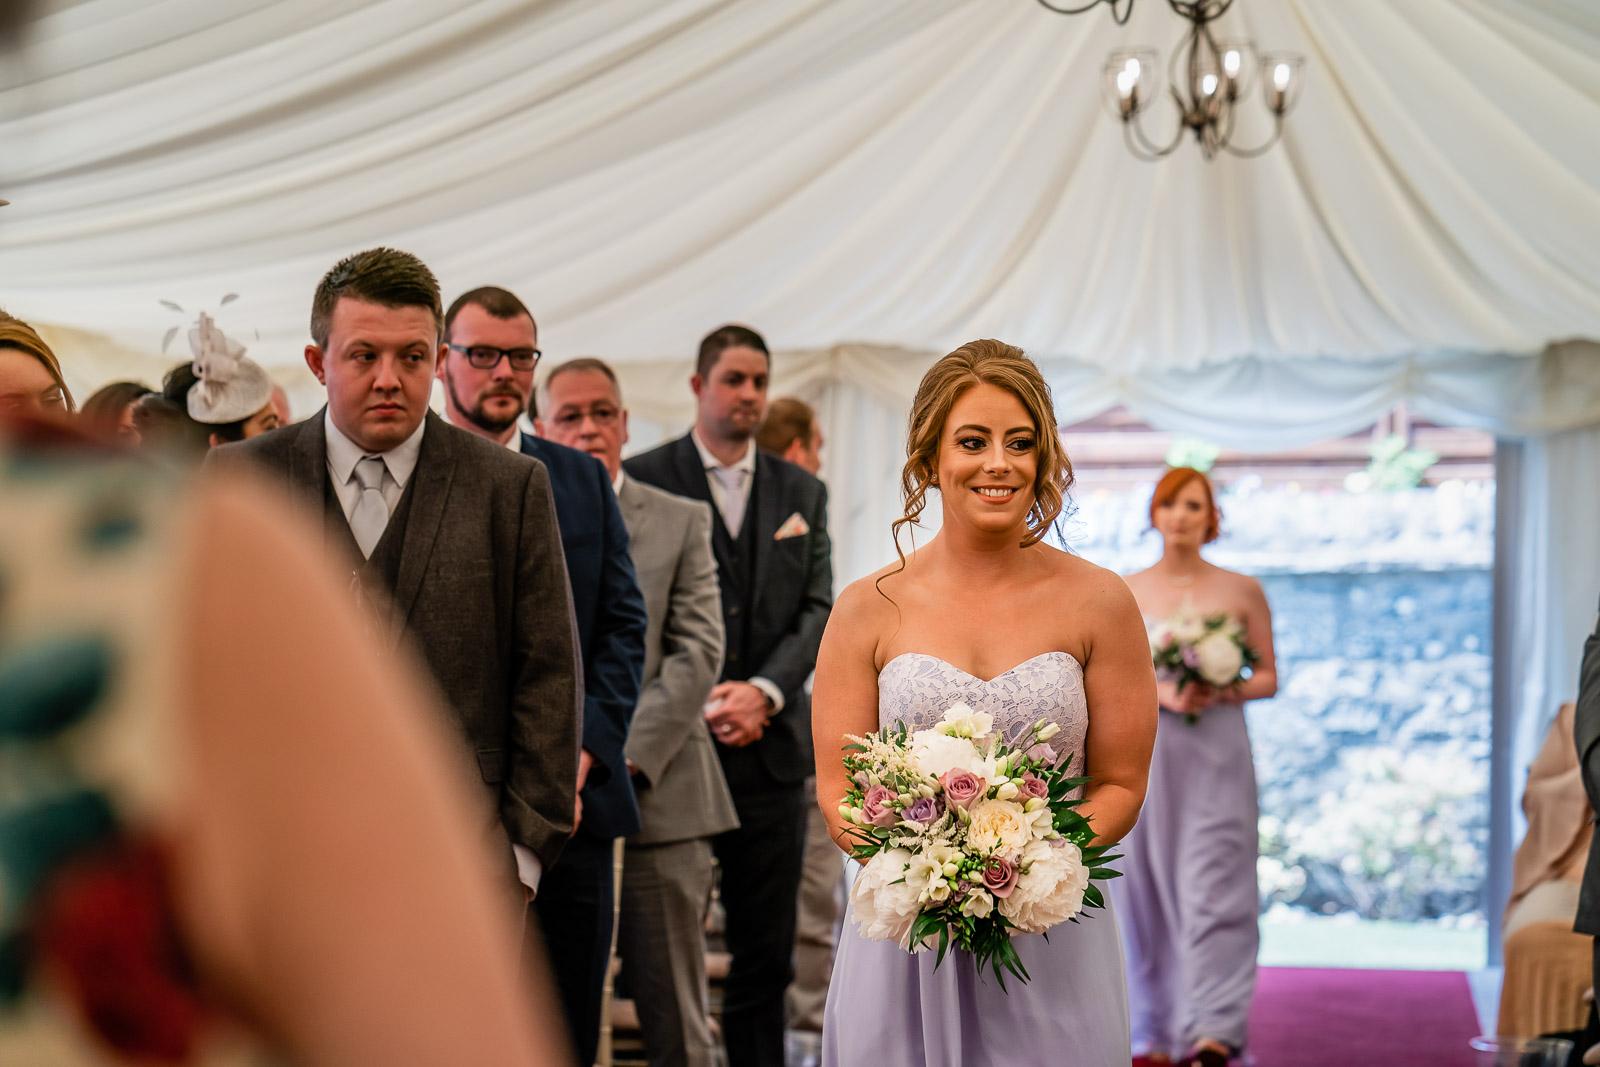 cornhill_castle_wedding_biggar_dearlyphotography (86 of 448).jpg